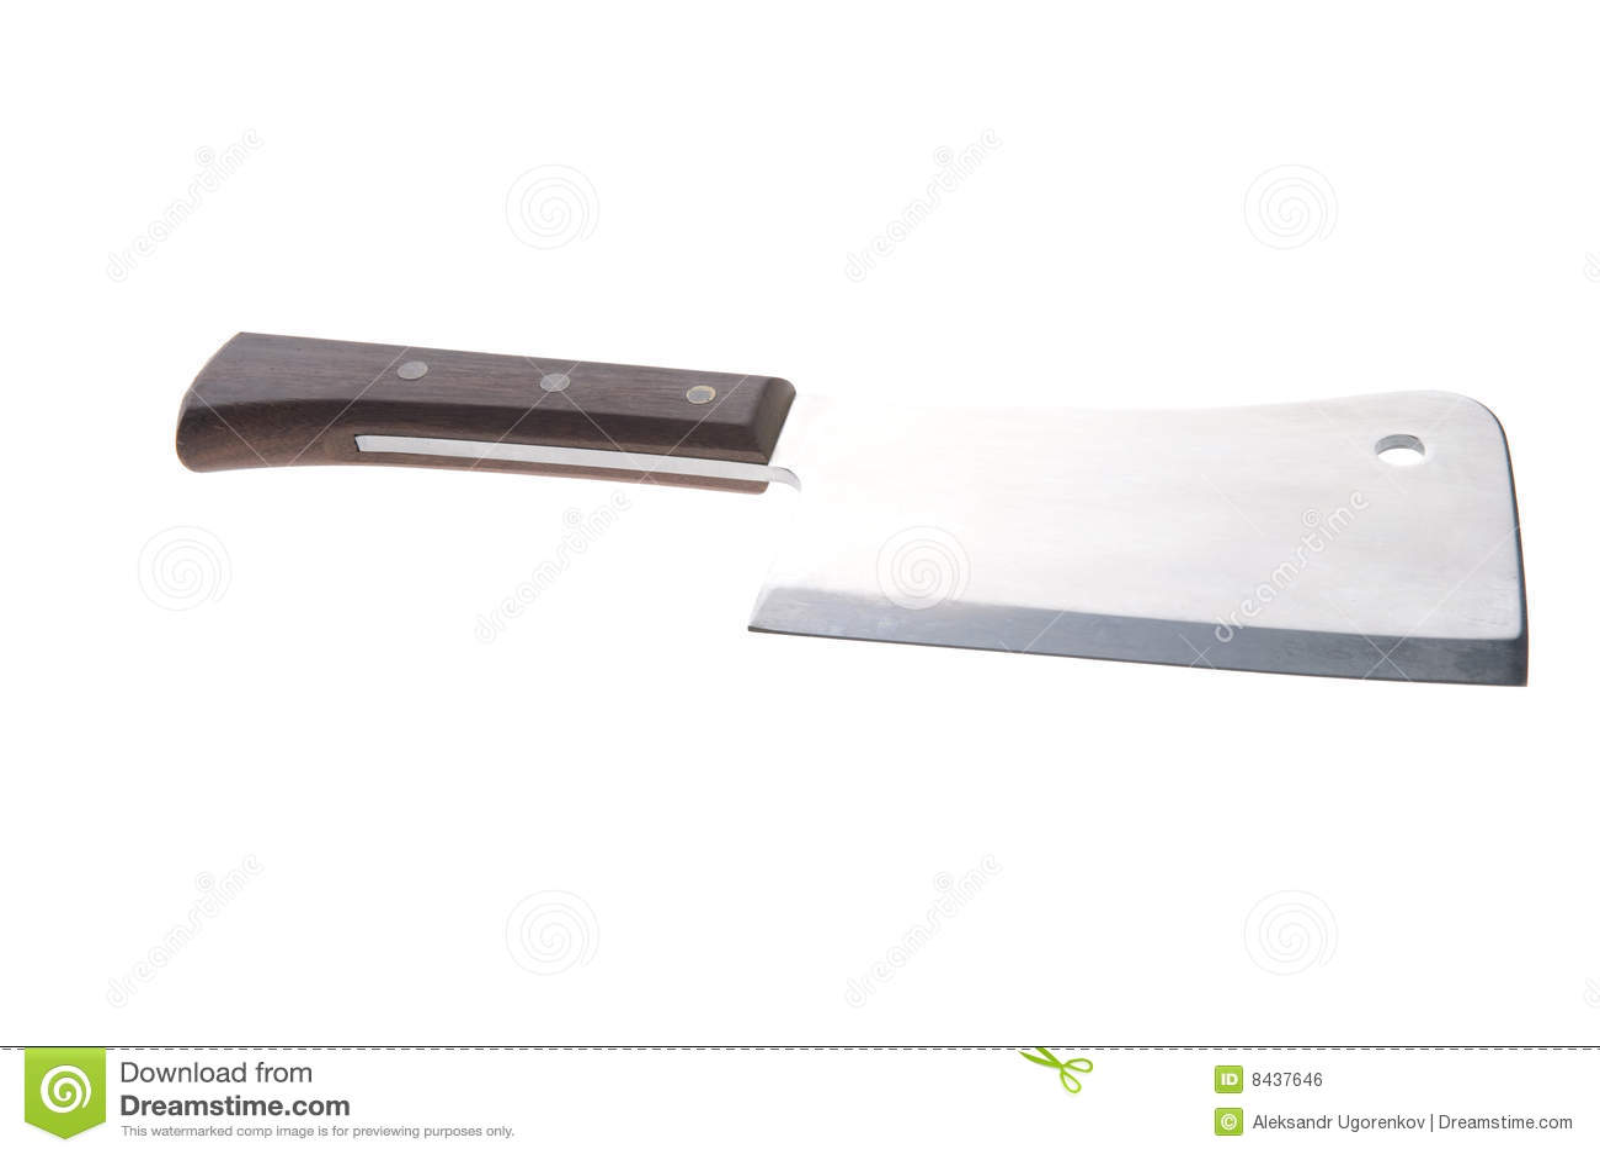 Big kitchen knife on white